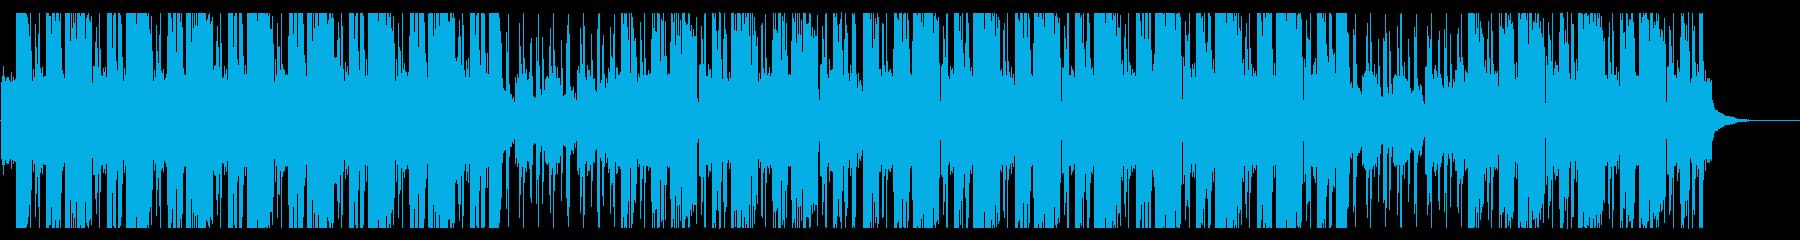 FutureBass風BGMの再生済みの波形